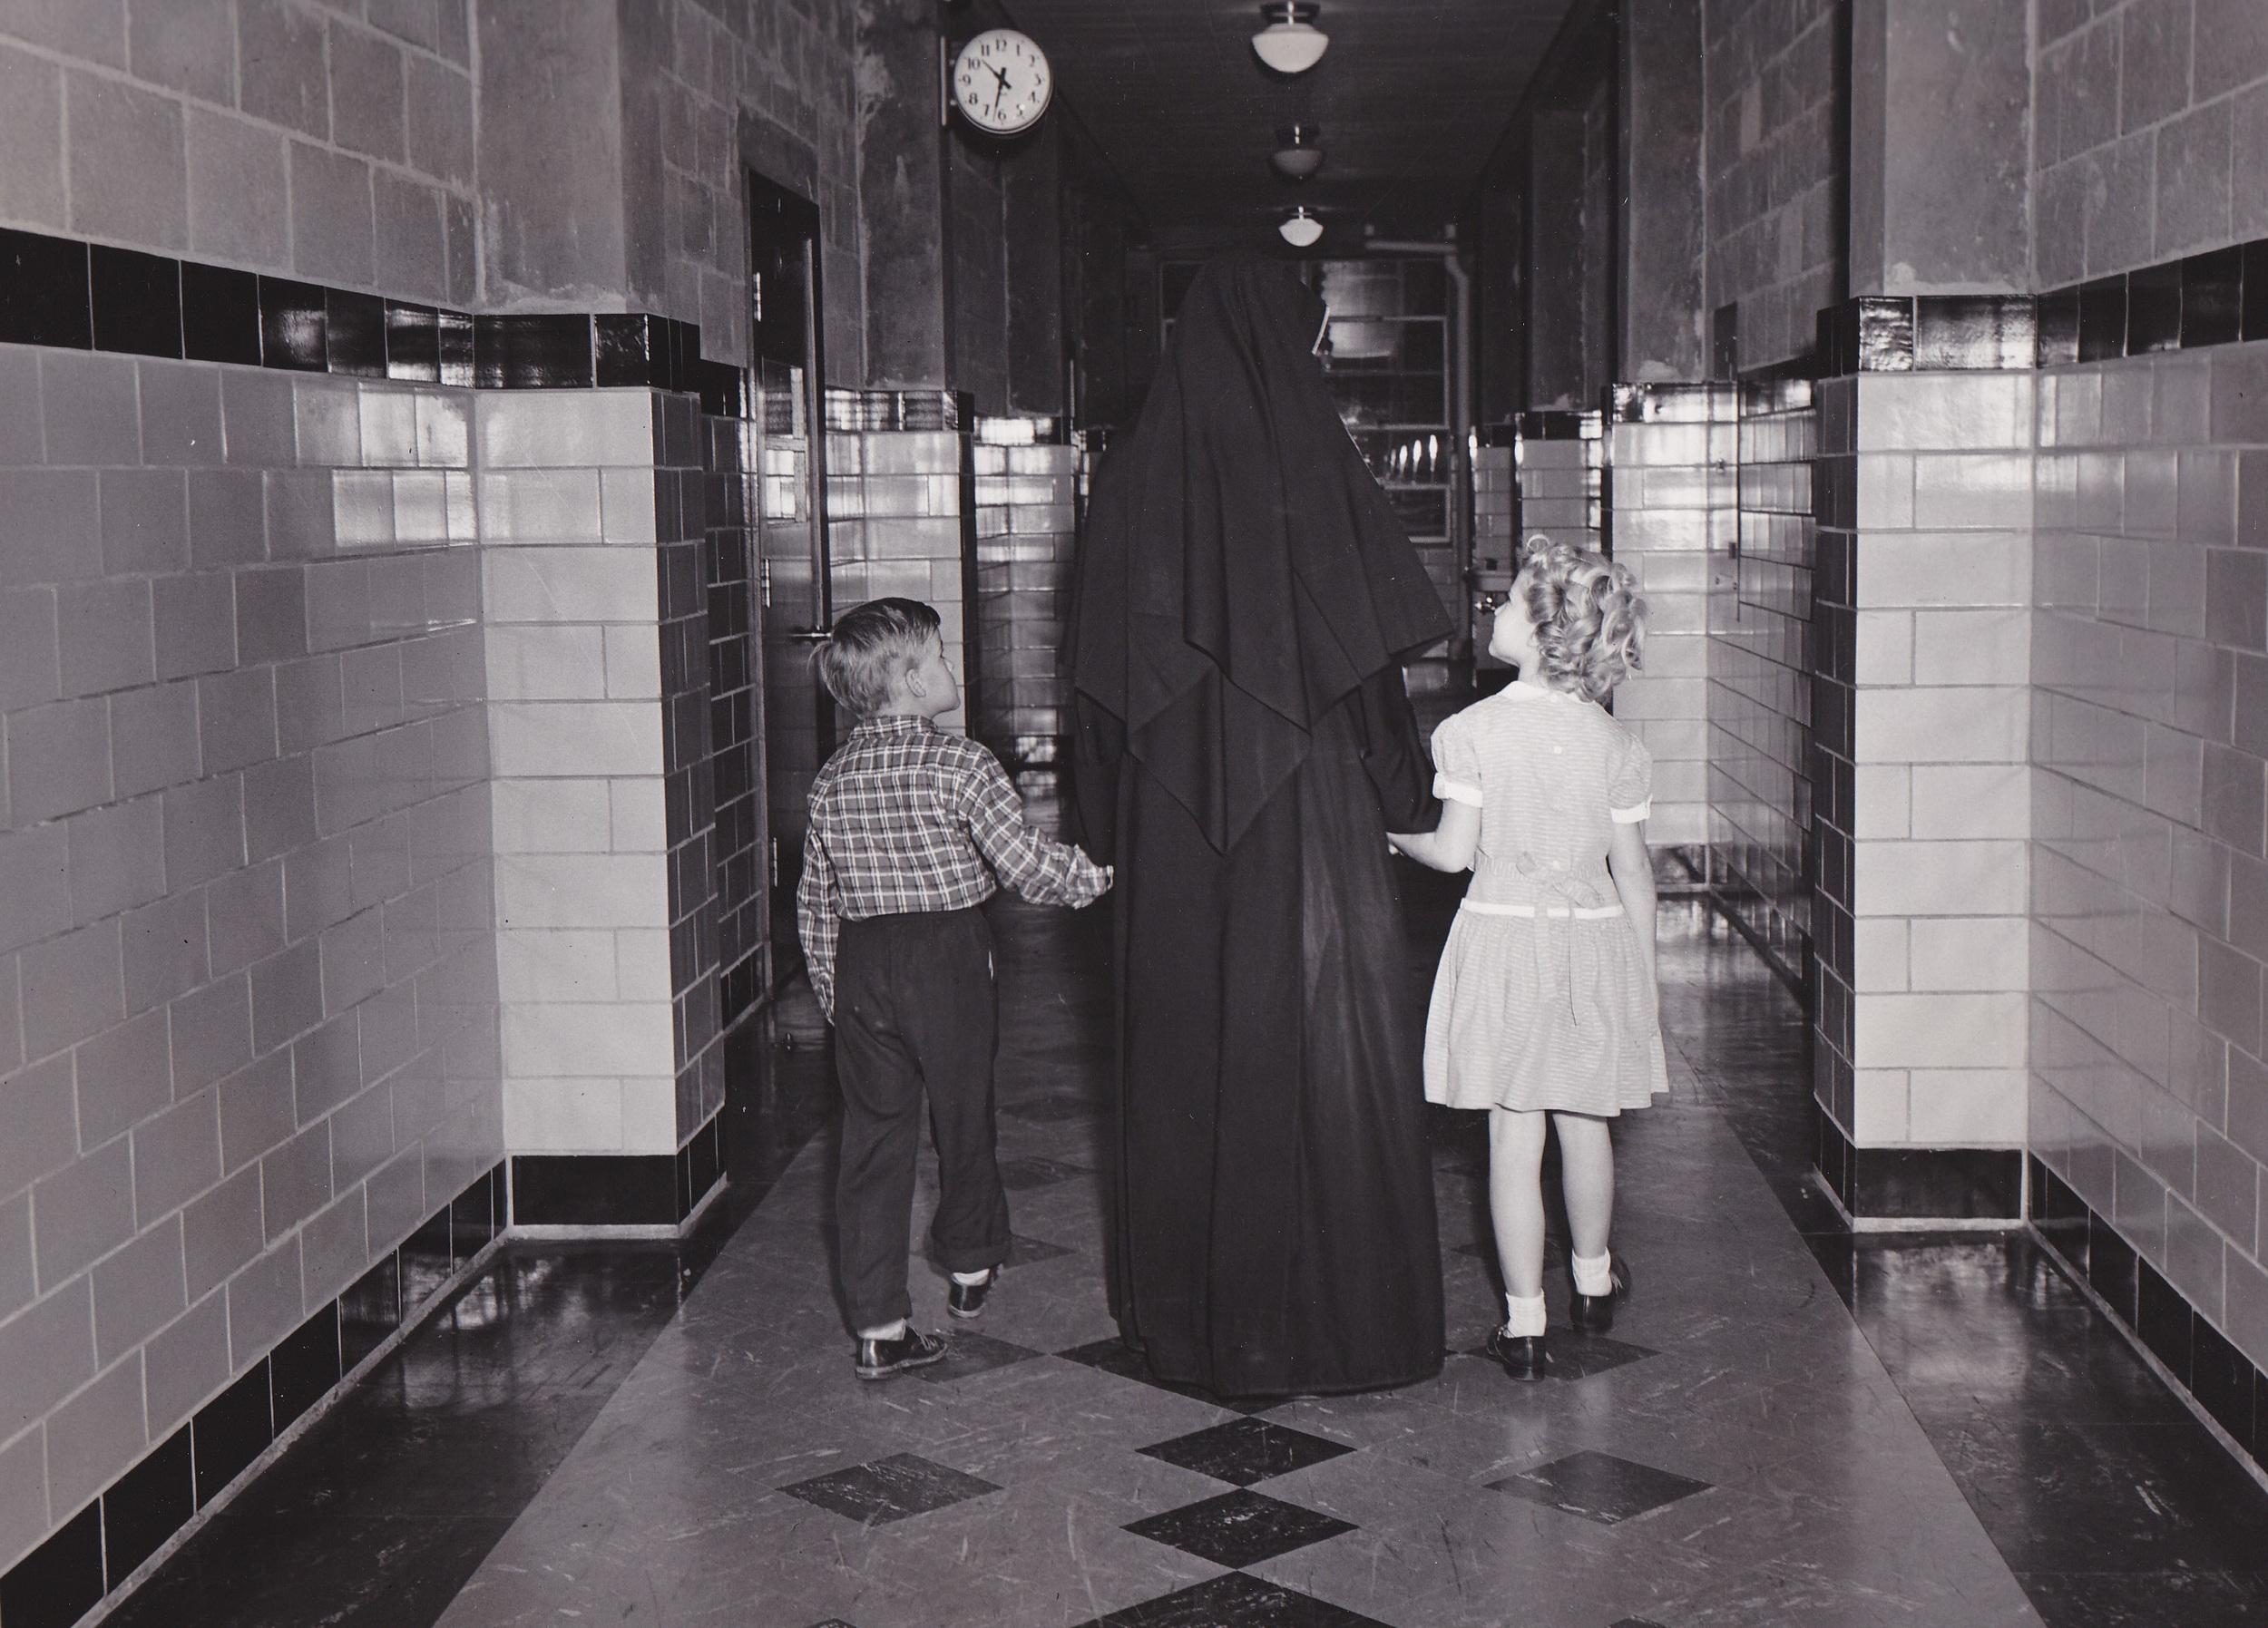 10-Sr and Kids Hallway 1950s.jpg